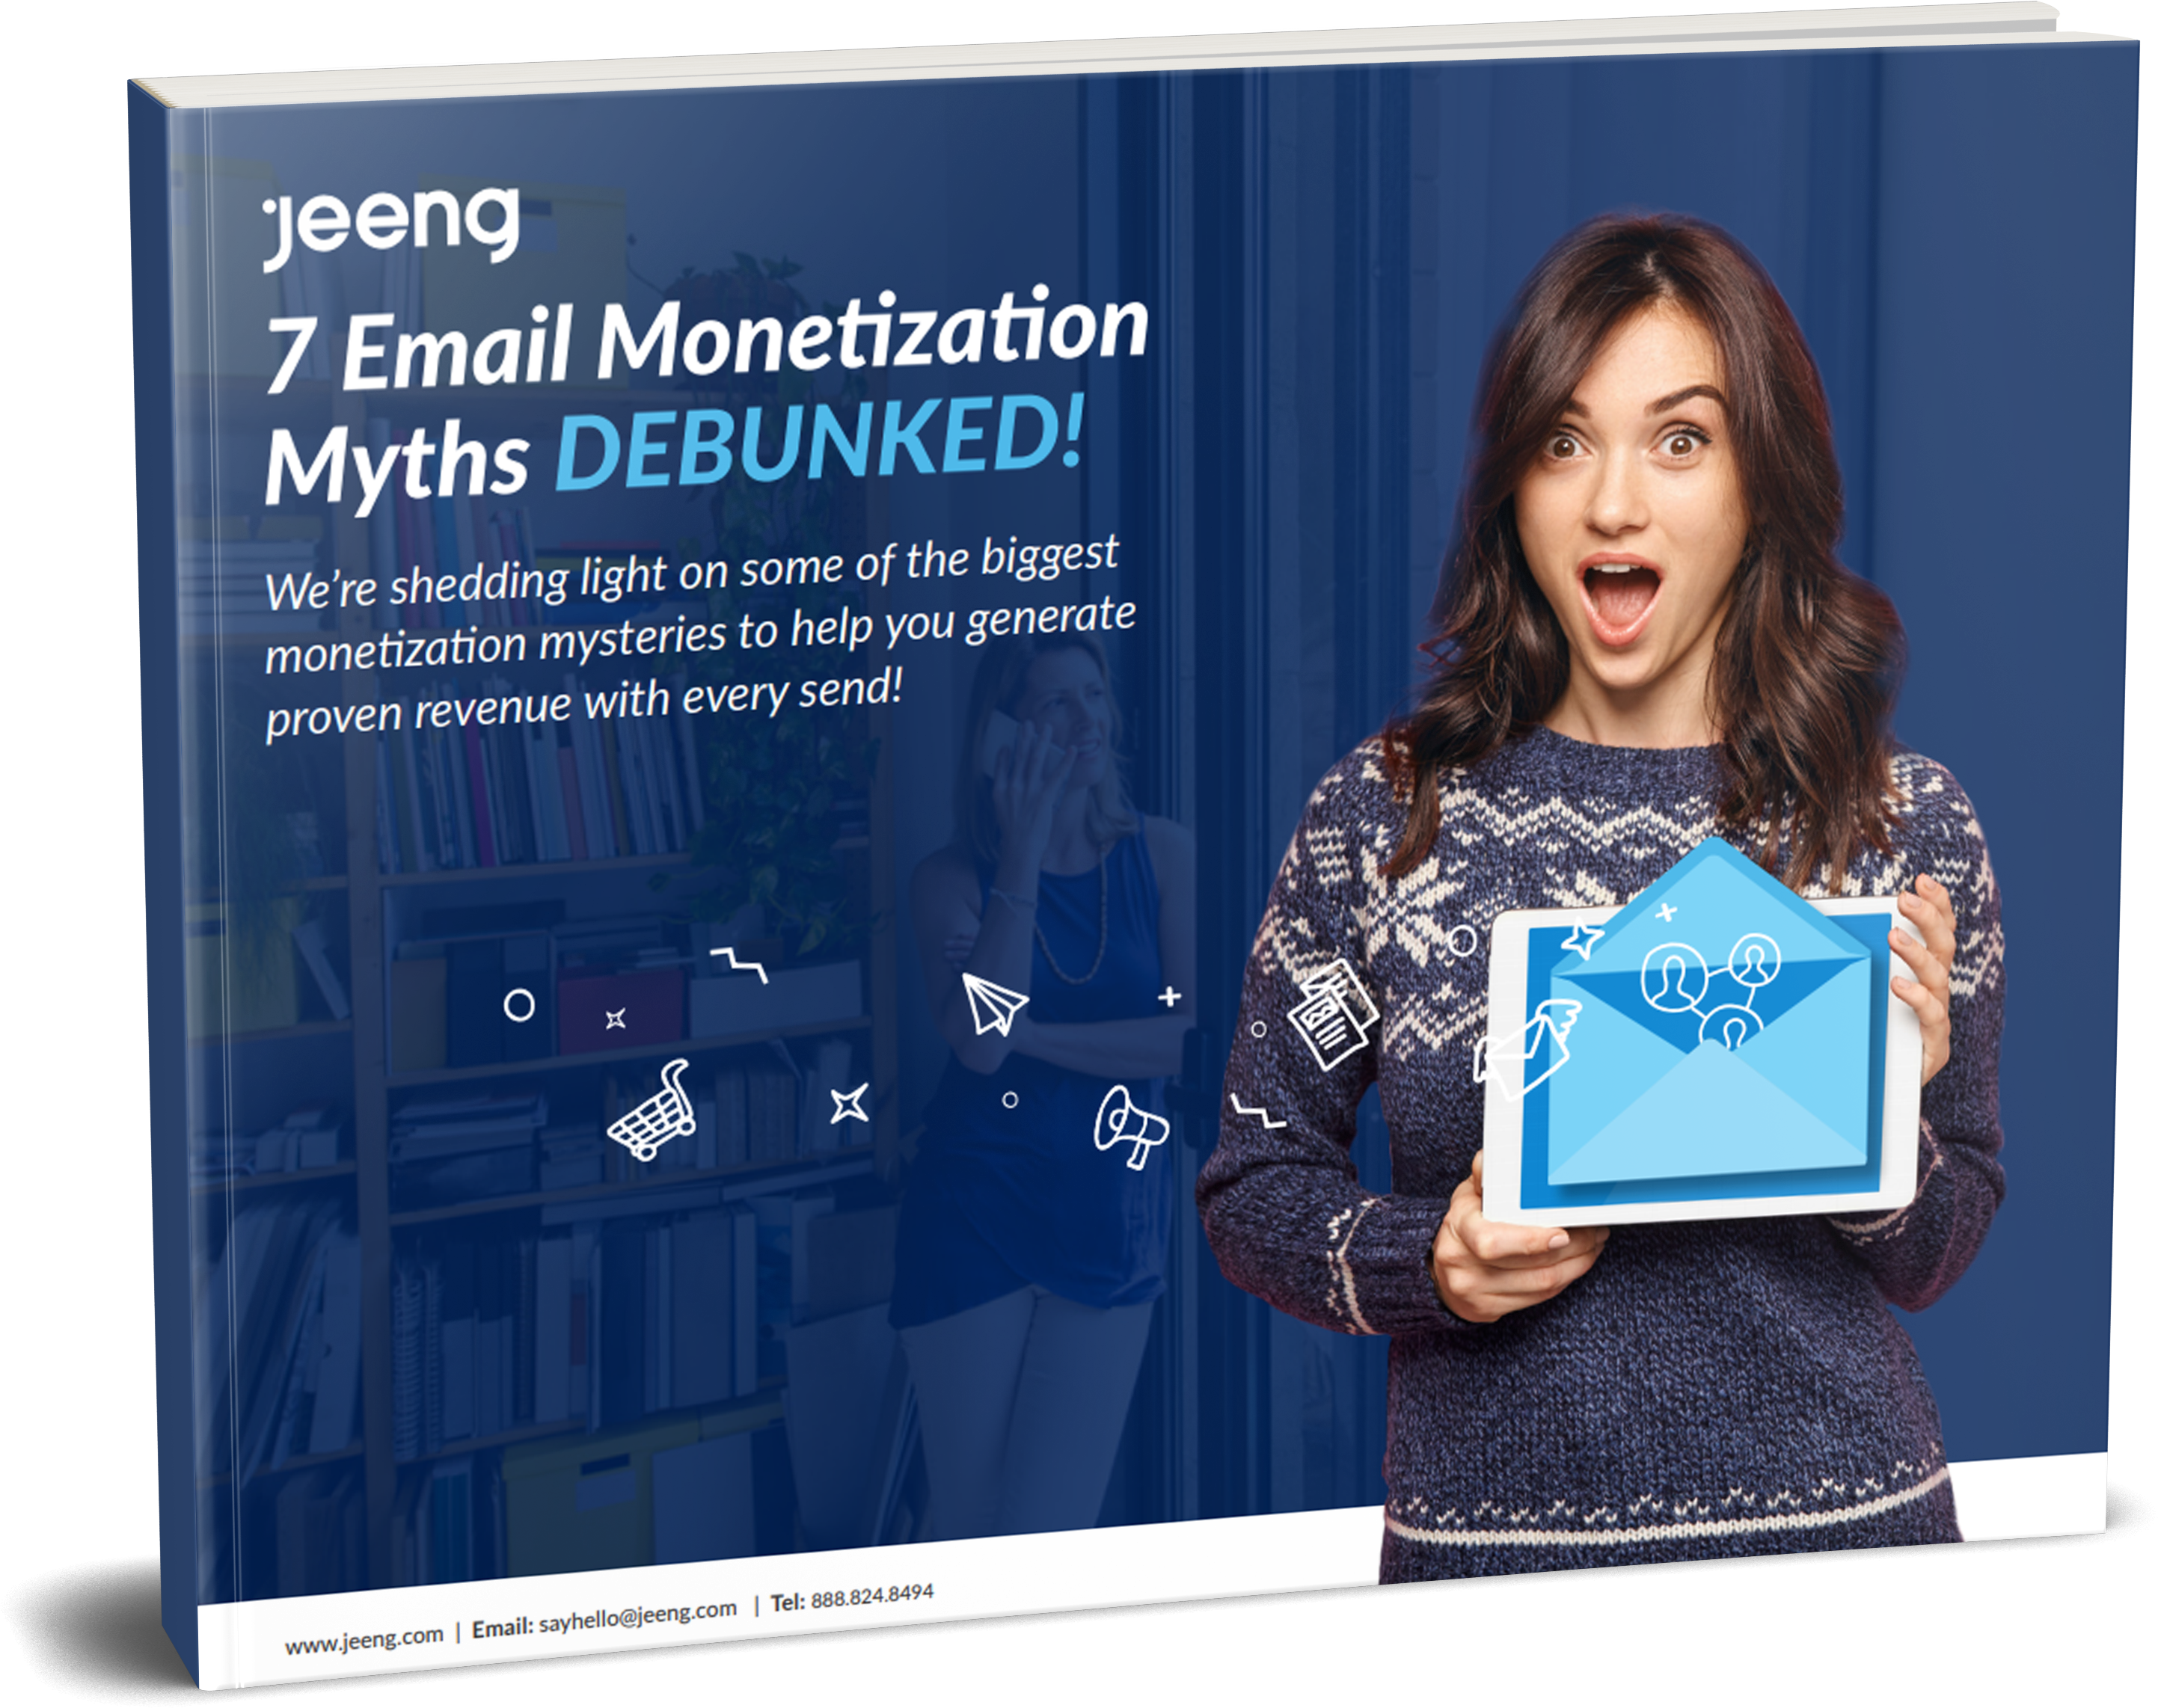 email-monetization-myths